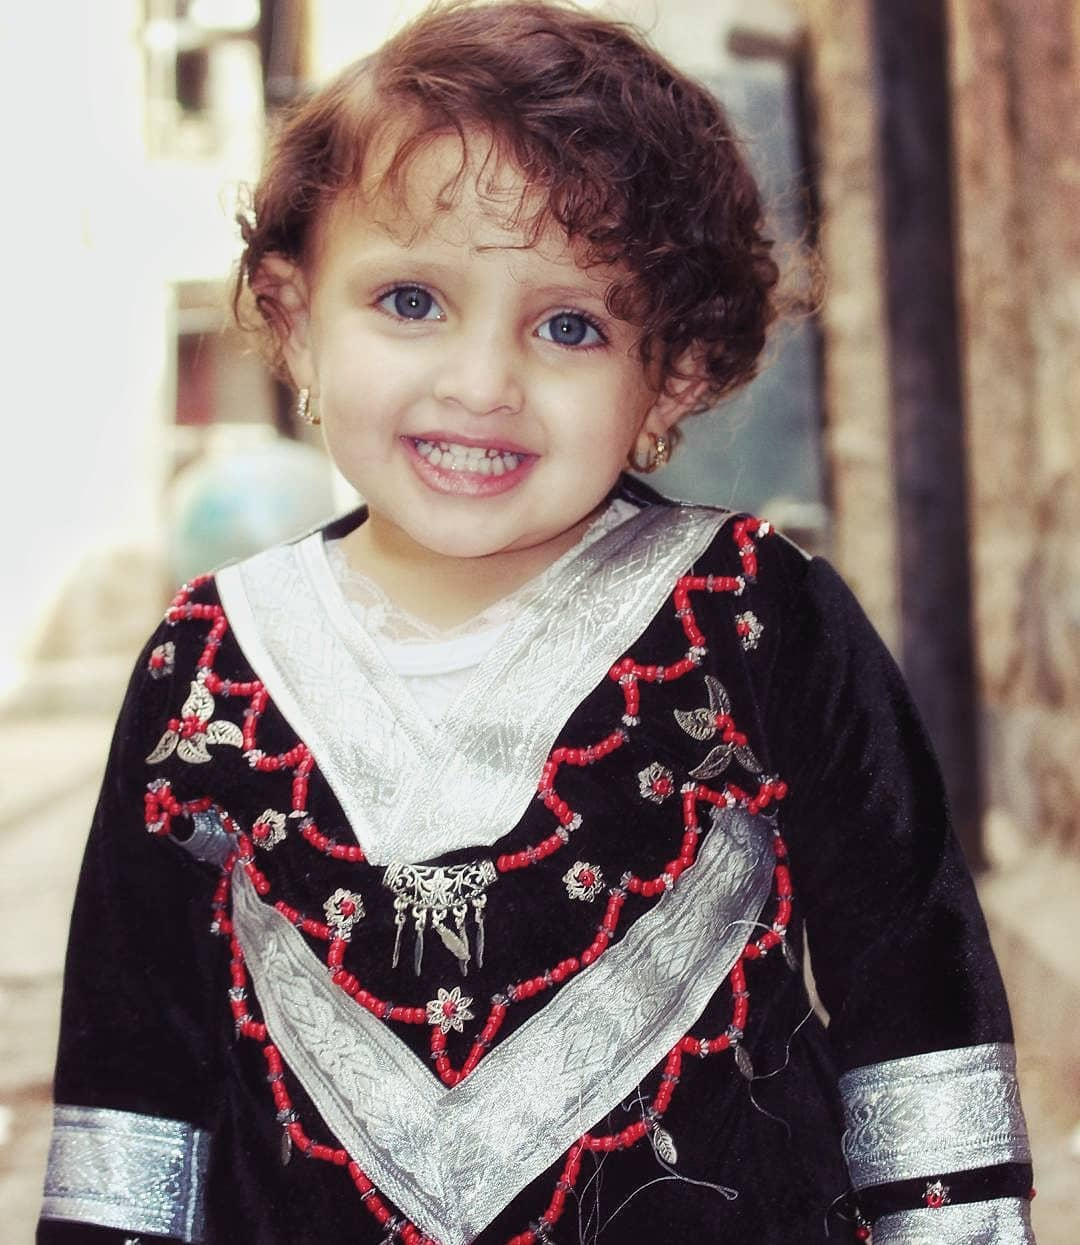 بالصور بنت صنعاء , اجمل صور بنات يمنيات 1864 11